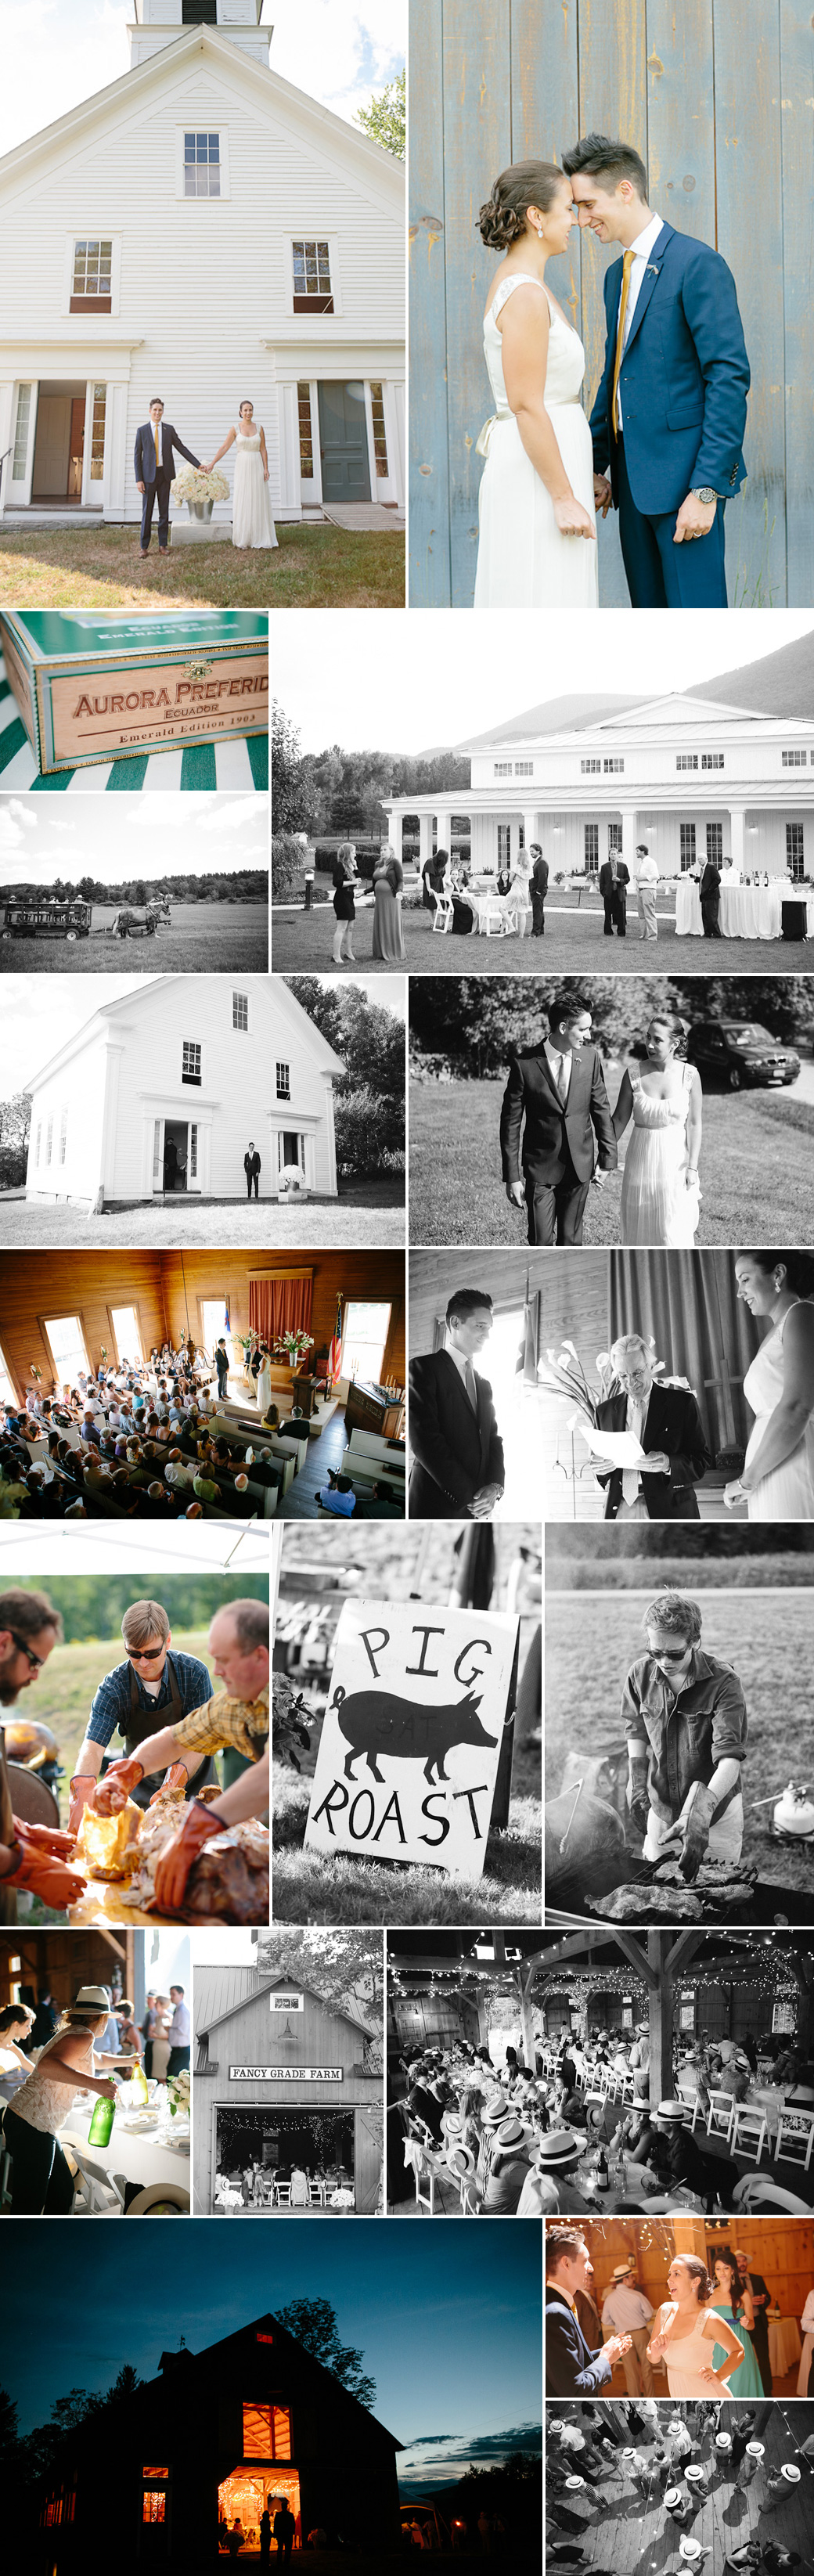 vermont-wedding-in-a-barn.jpg